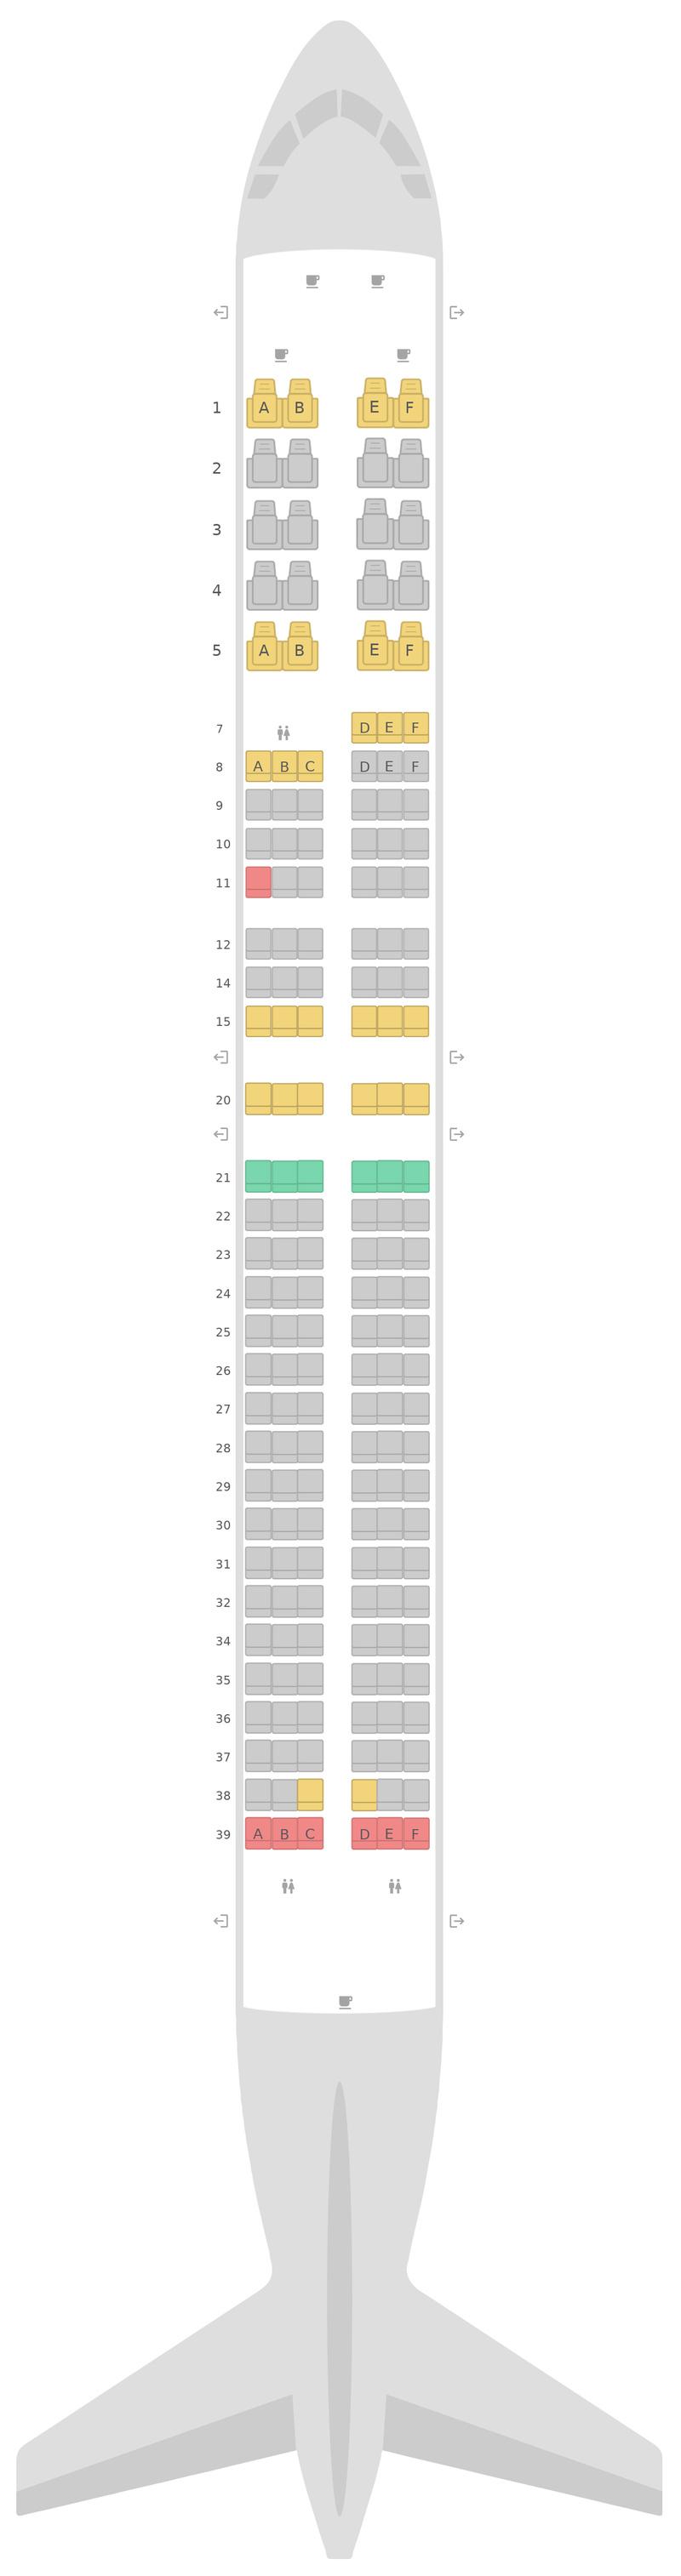 Схема салона Боинг 737-900 (739) v2 United